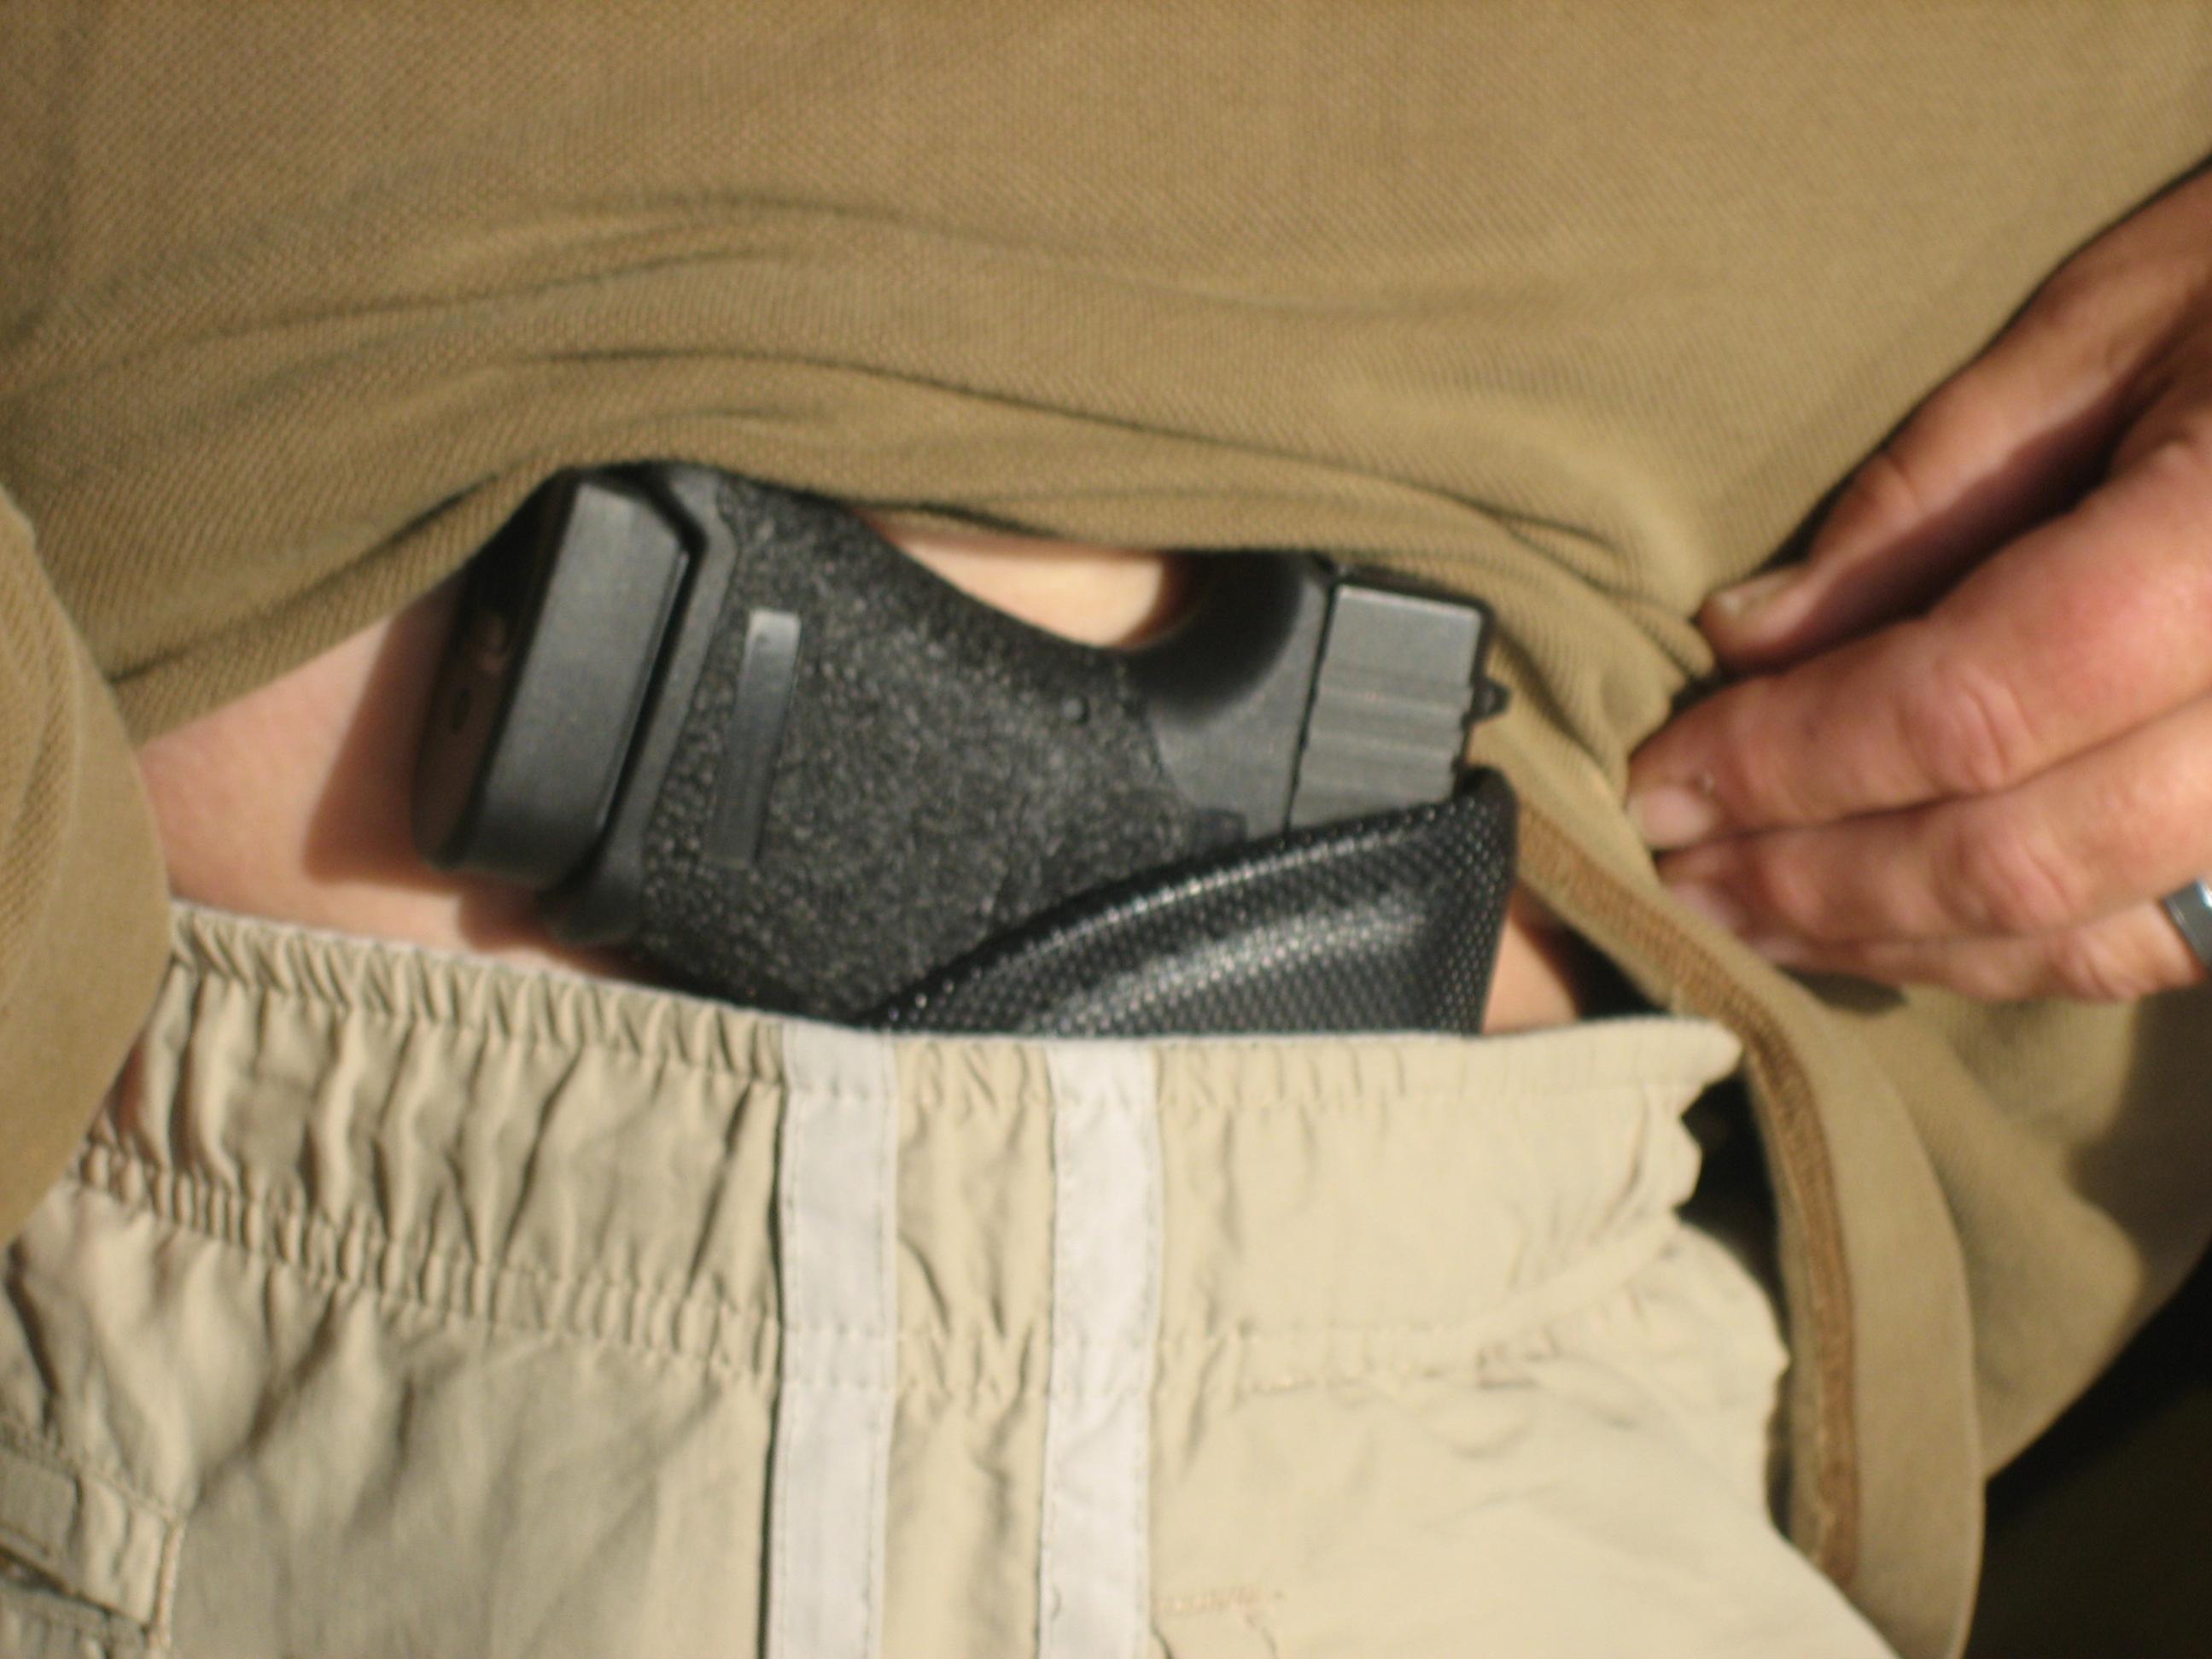 glock 36-remora-001.jpg